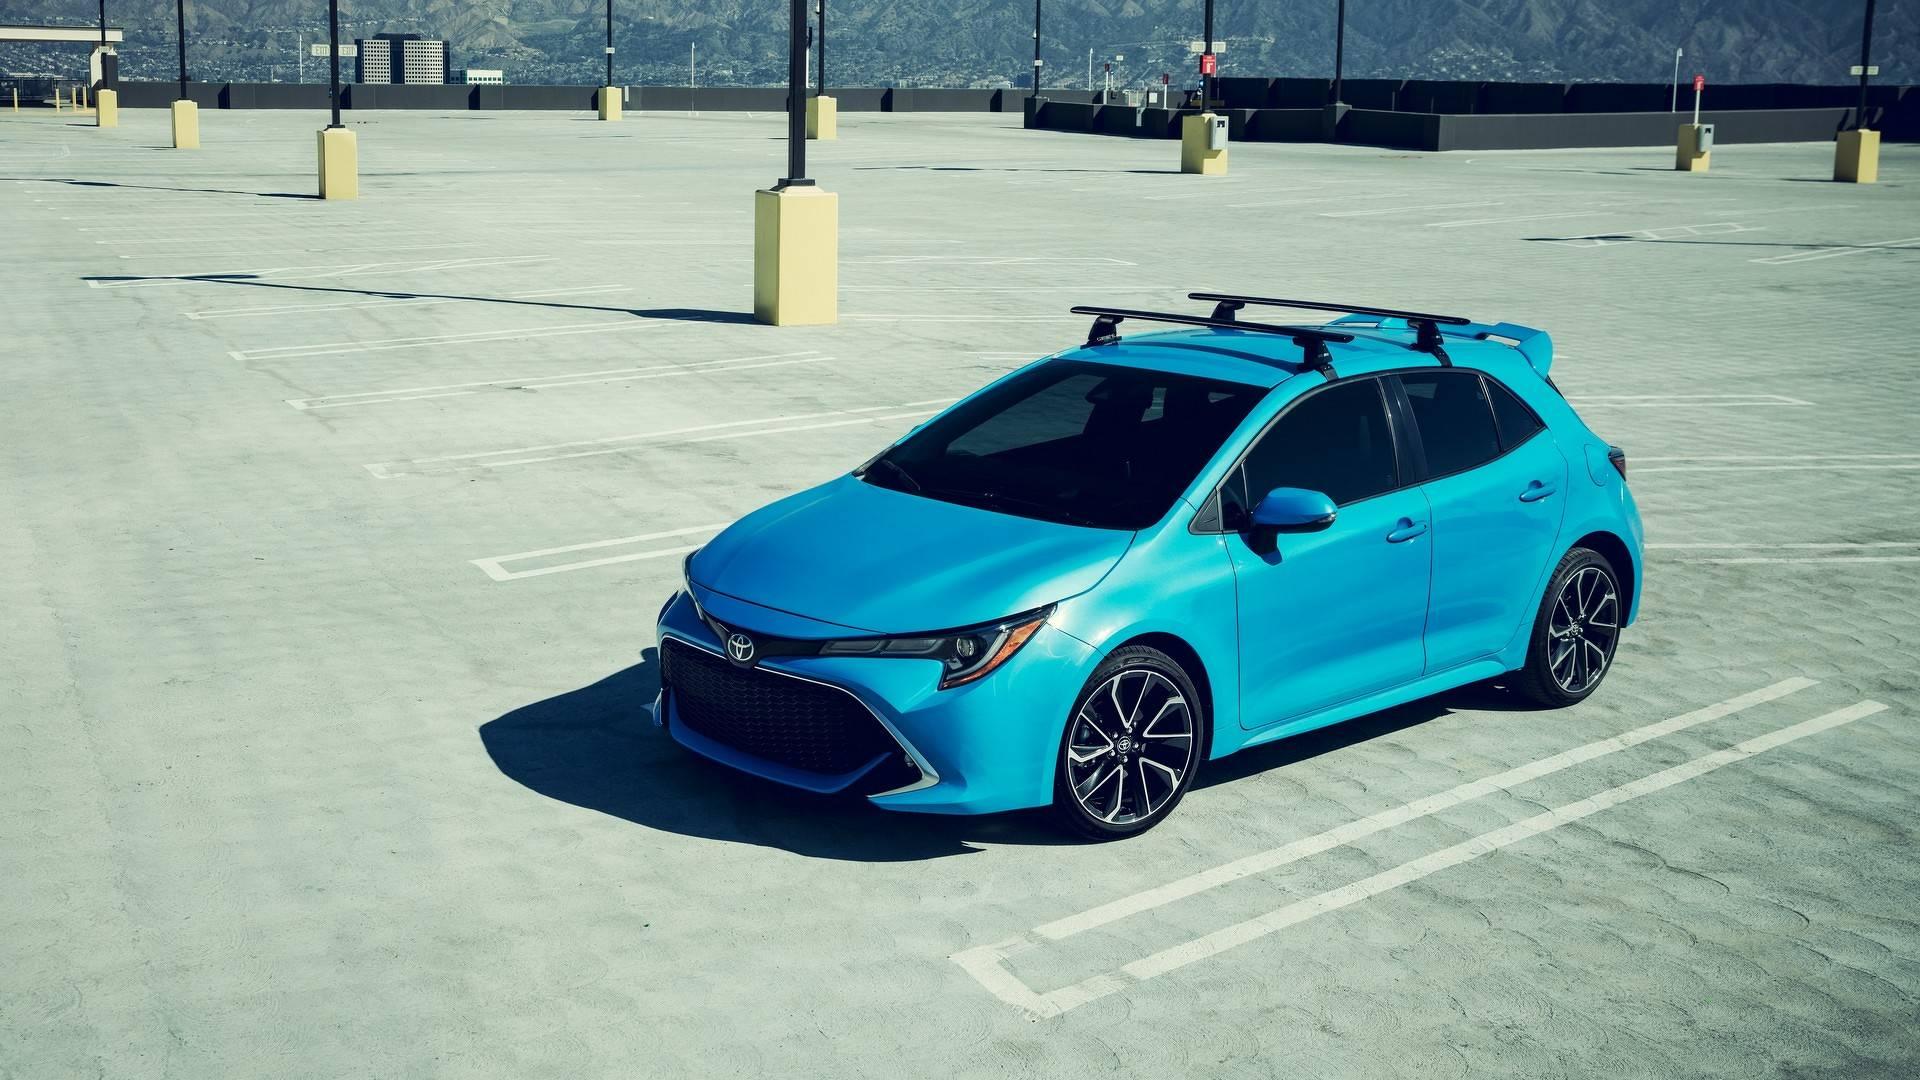 2019 Toyota Corolla Interior And Exterior Detailed Ahead Of Ny Auto